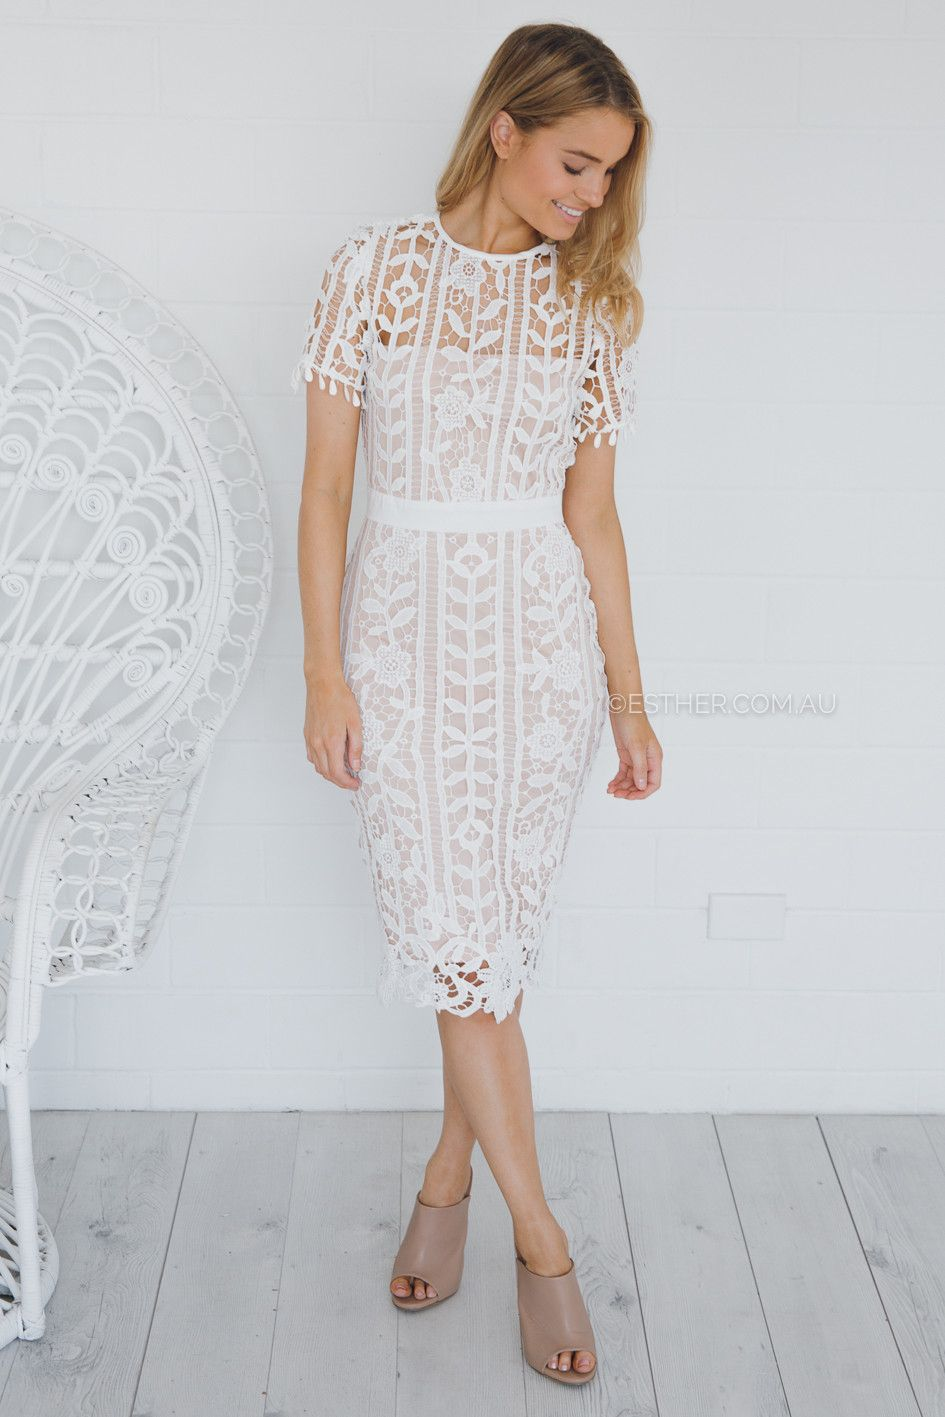 carmen dress - white | Esther clothing Australia and America USA ...